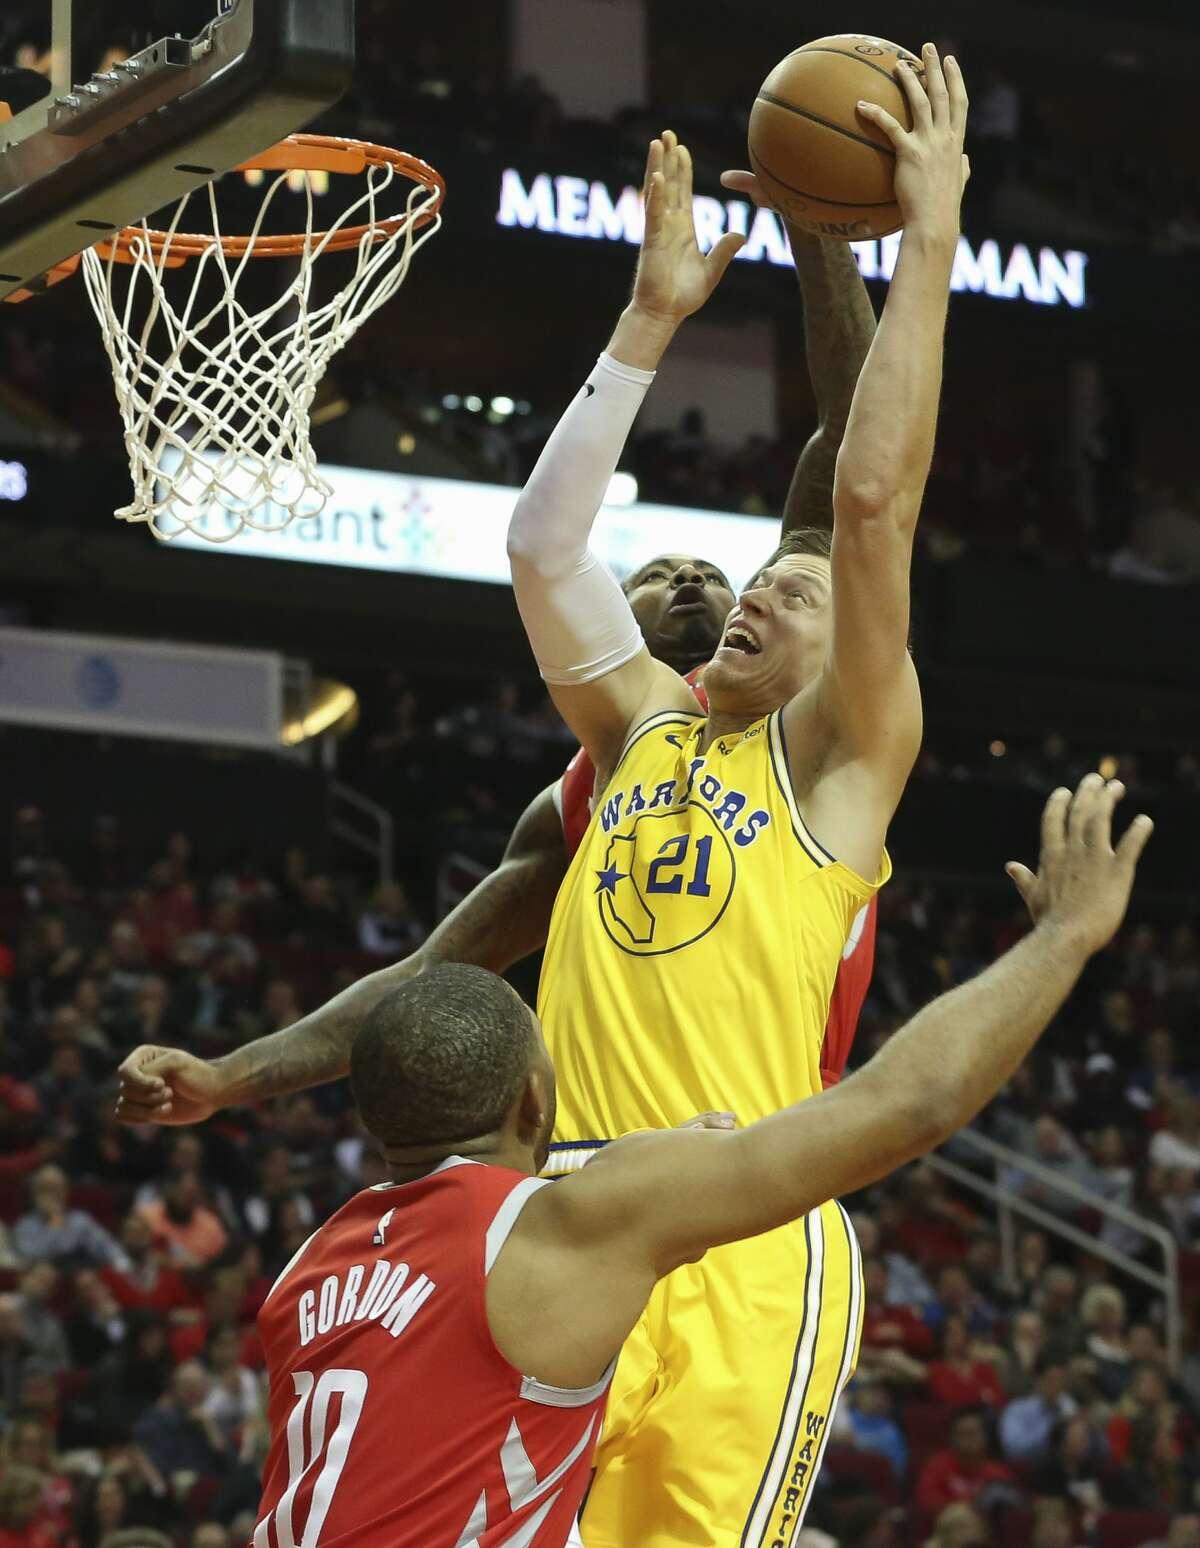 Houston Rockets forward Gary Clark (6) fouls on Golden State Warriors forward Jonas Jerebko (21) during the fourth quarter of the NBA game at Toyota Center on Thursday, Nov. 15, 2018, in Houston. The Houston Rockets defeated the Golden State Warriors 107-86.